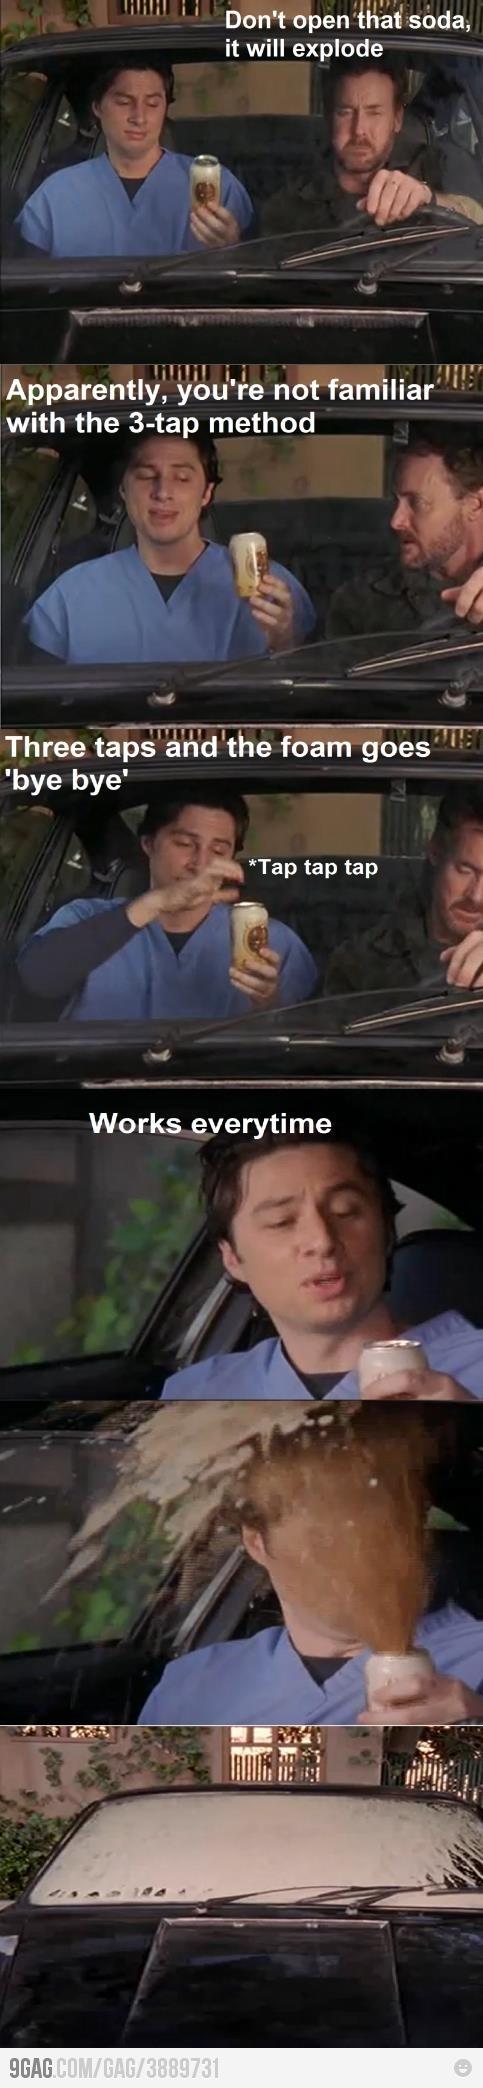 Scrubs! Hilarious:)